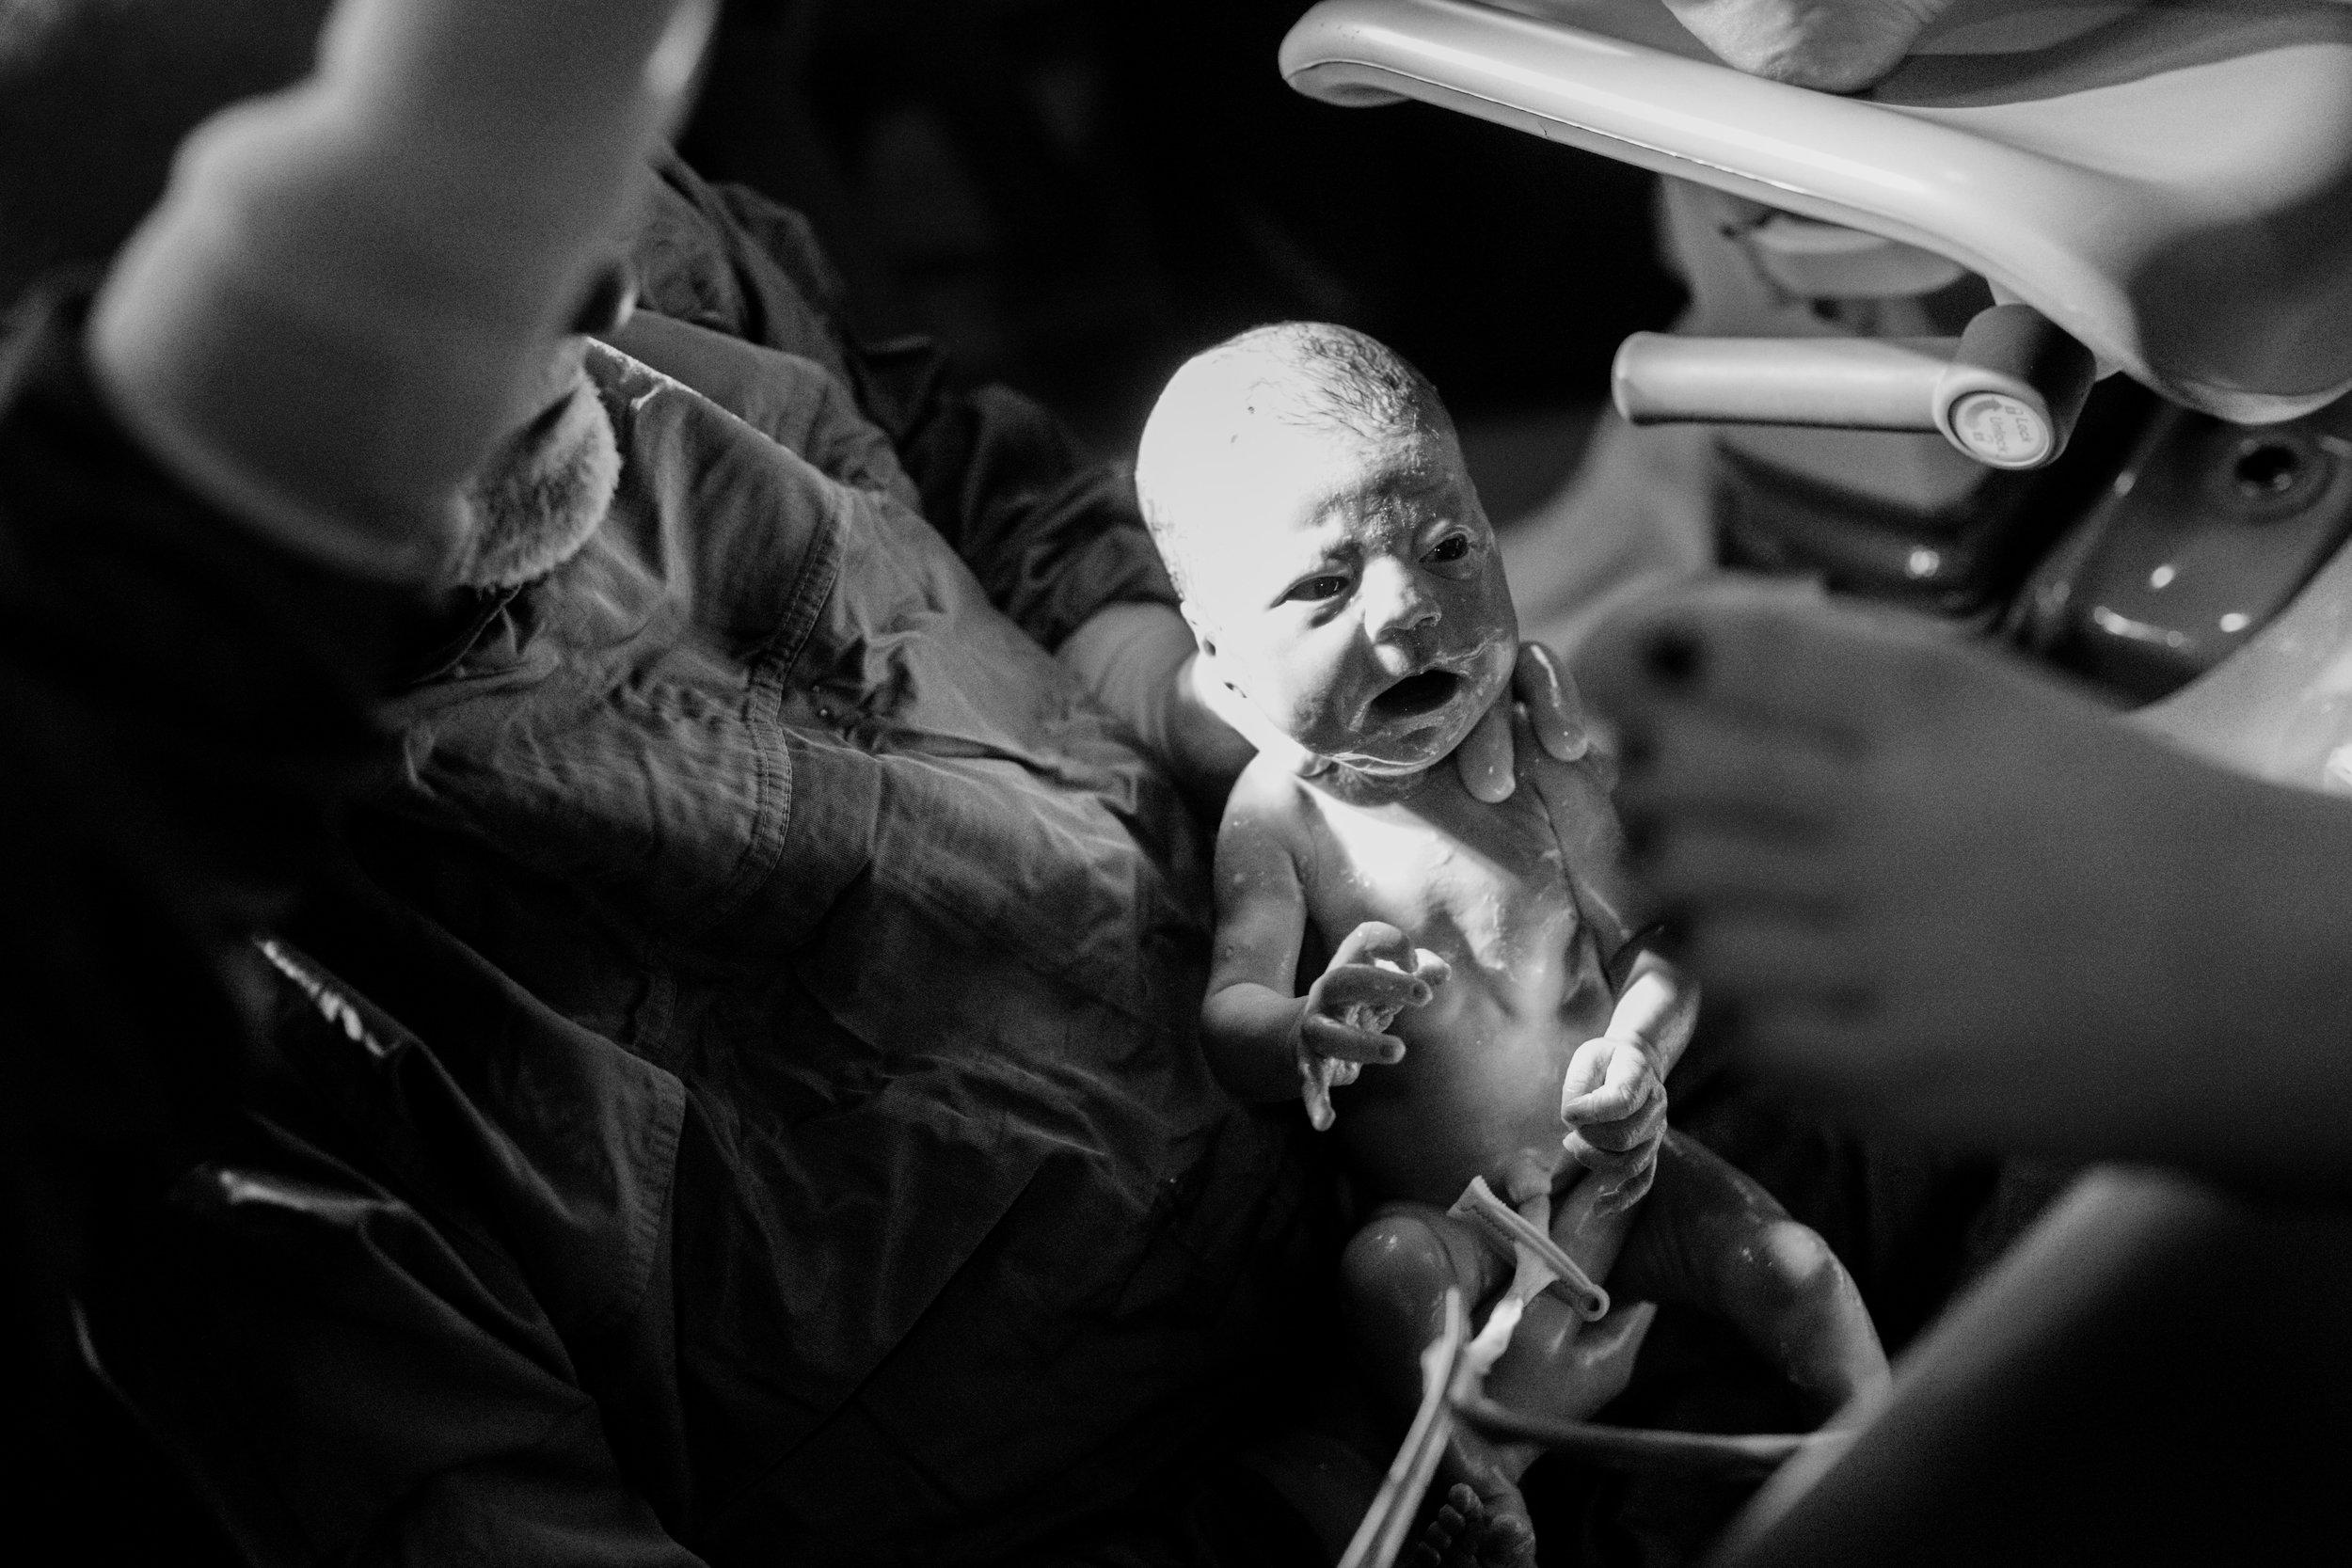 Marley Birth Photography - Nashville Newborn Photography - Chelsea Meadows Photography (80).jpg